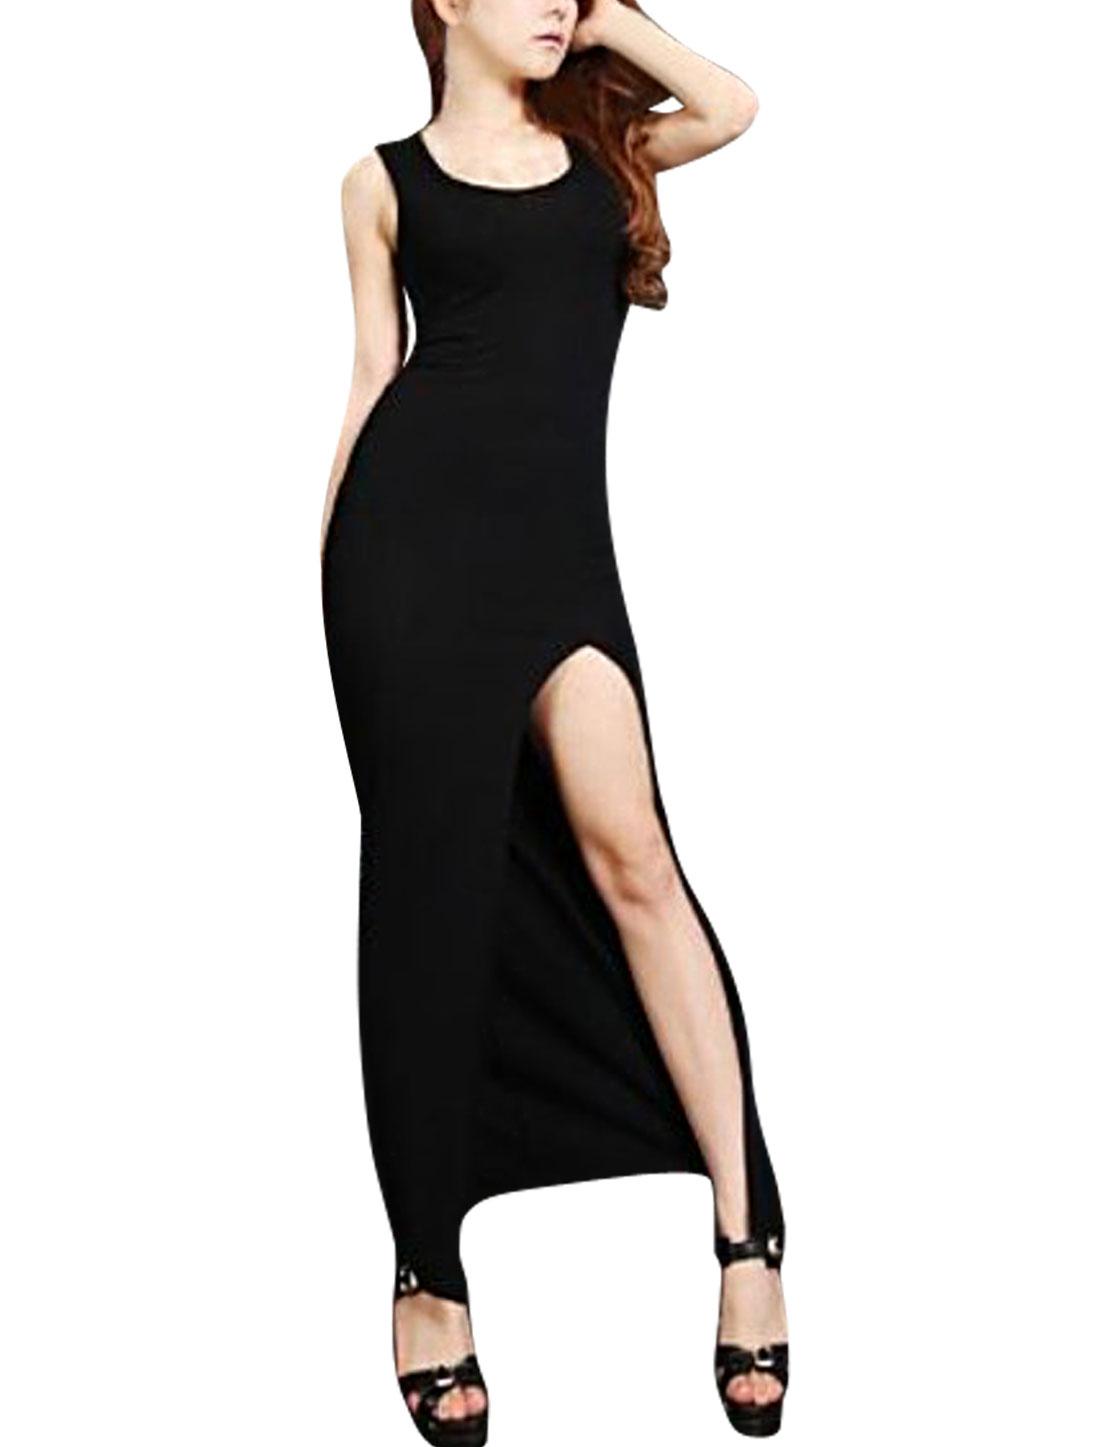 Ladies Mid-Calf Solid Color Sleeveless Elegant Dress Black XS